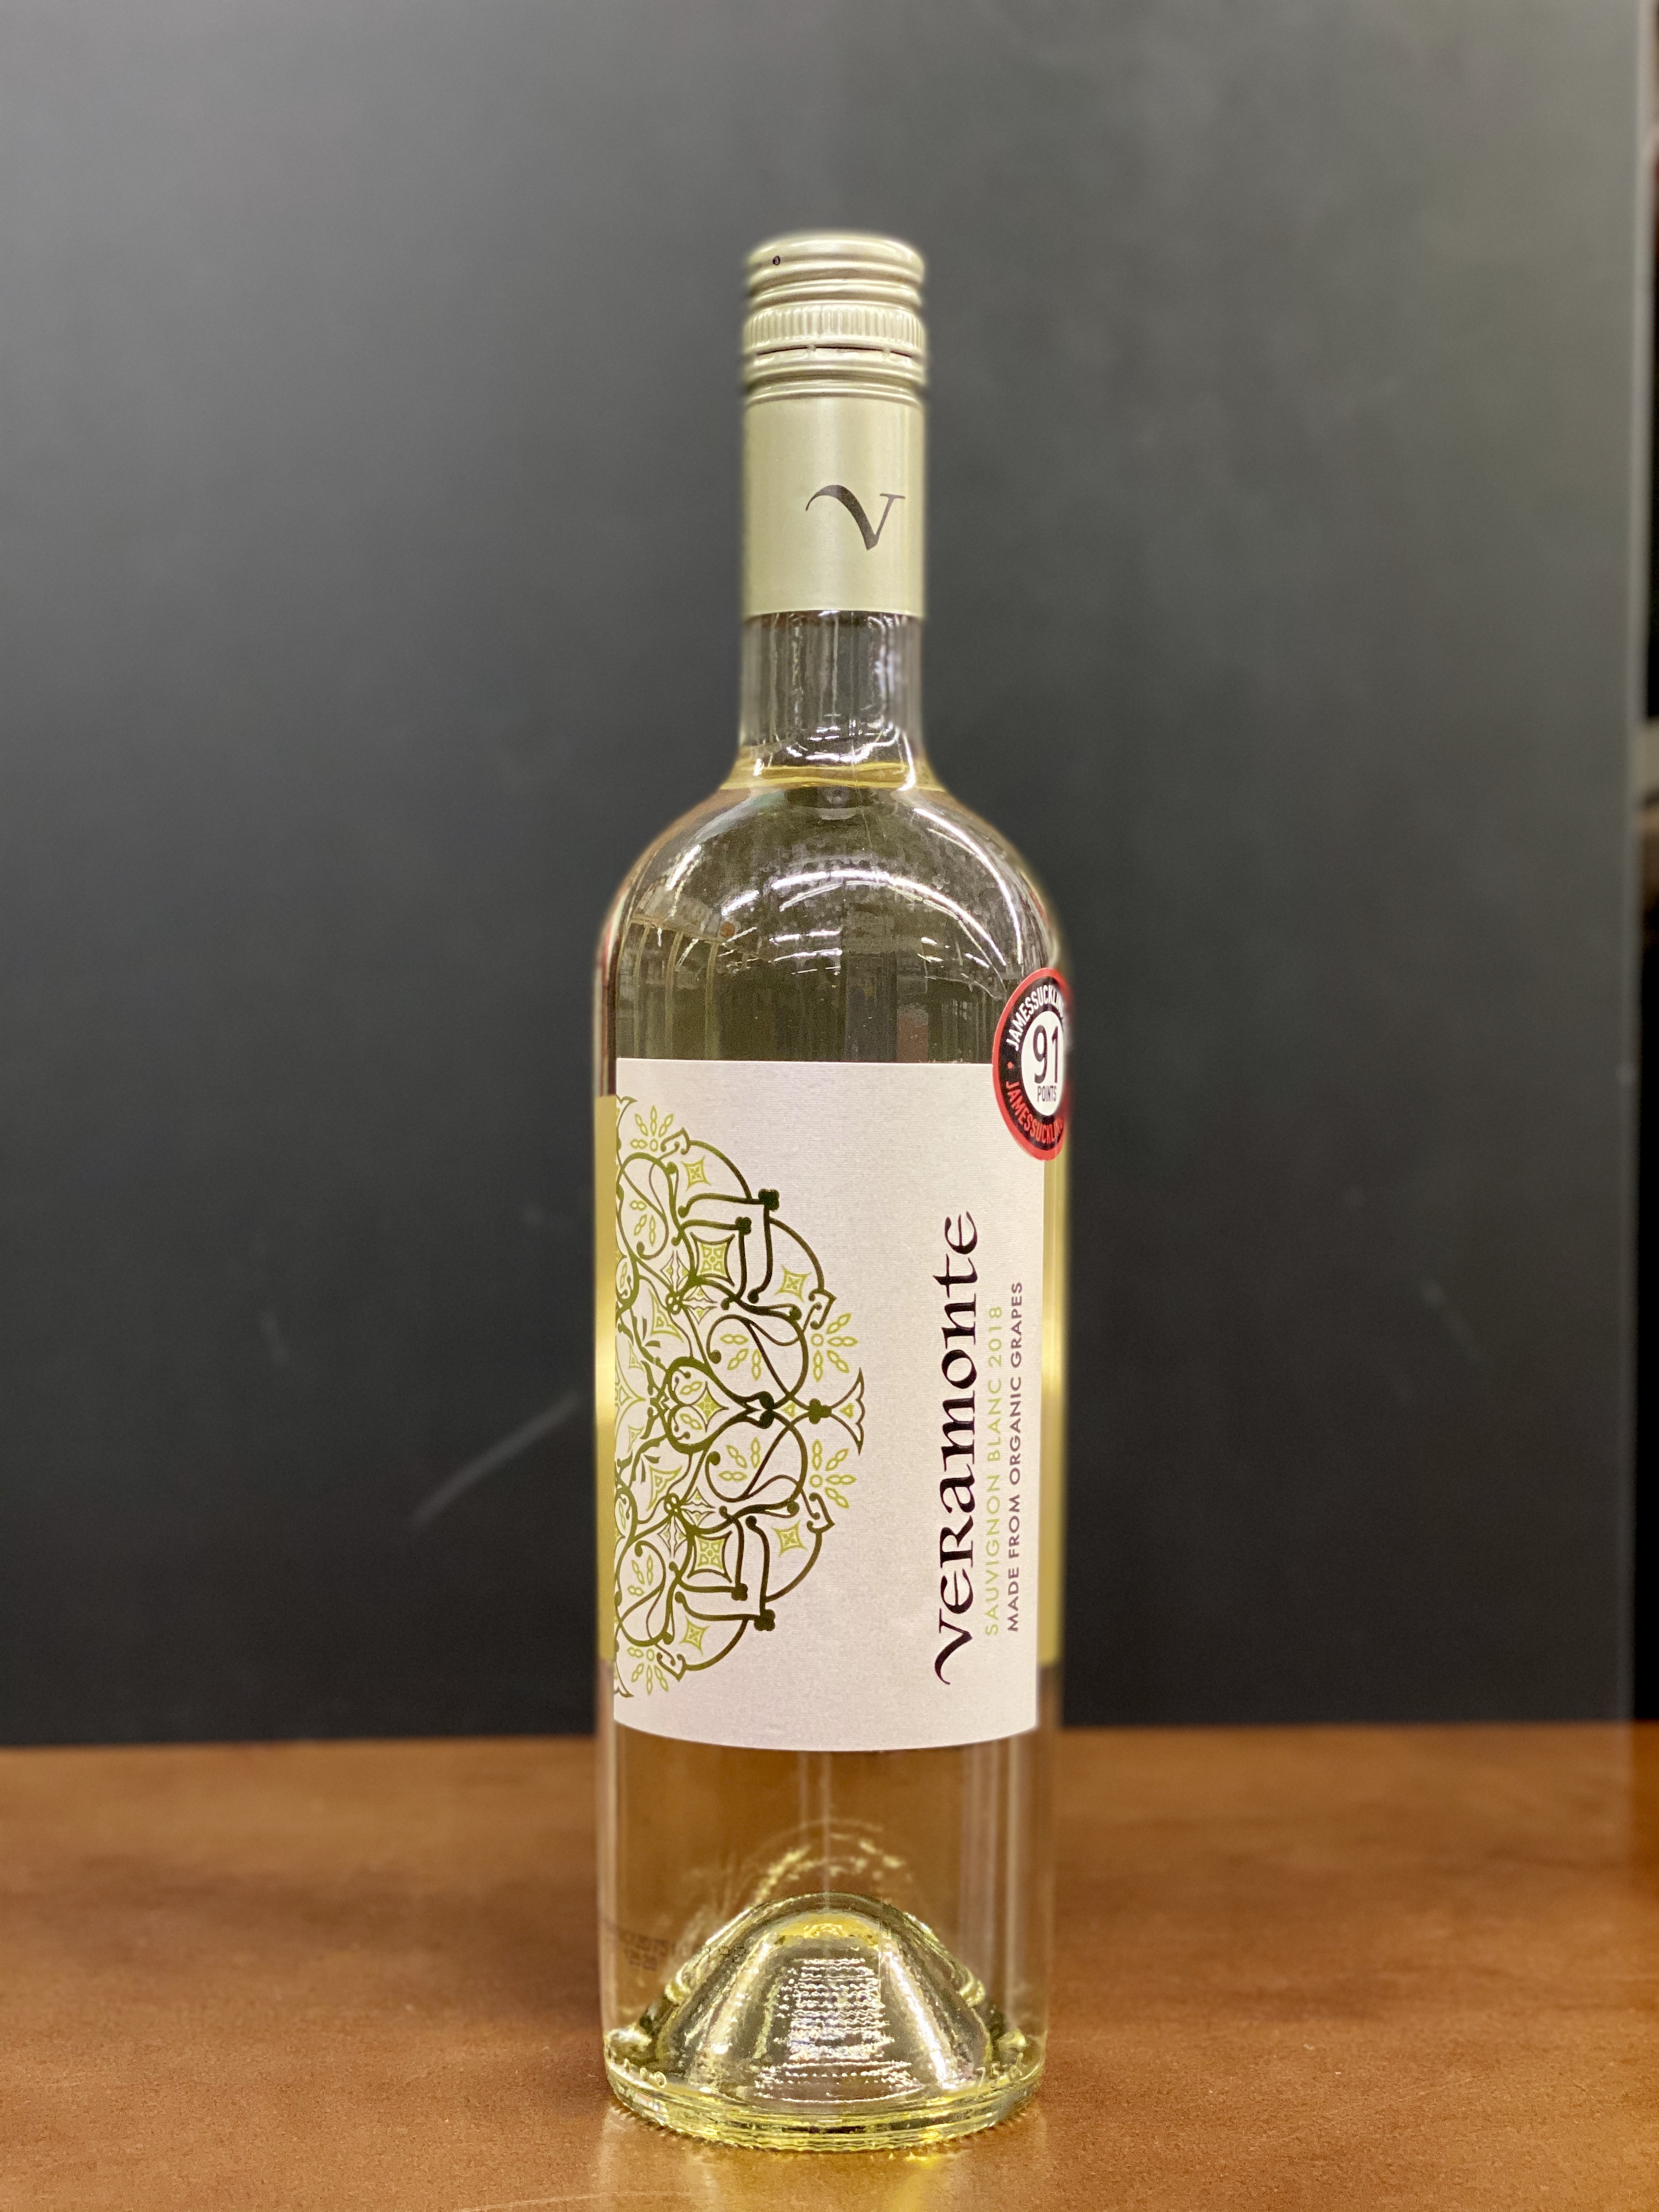 Veramonte Organic Sauvignon Blanc 2018